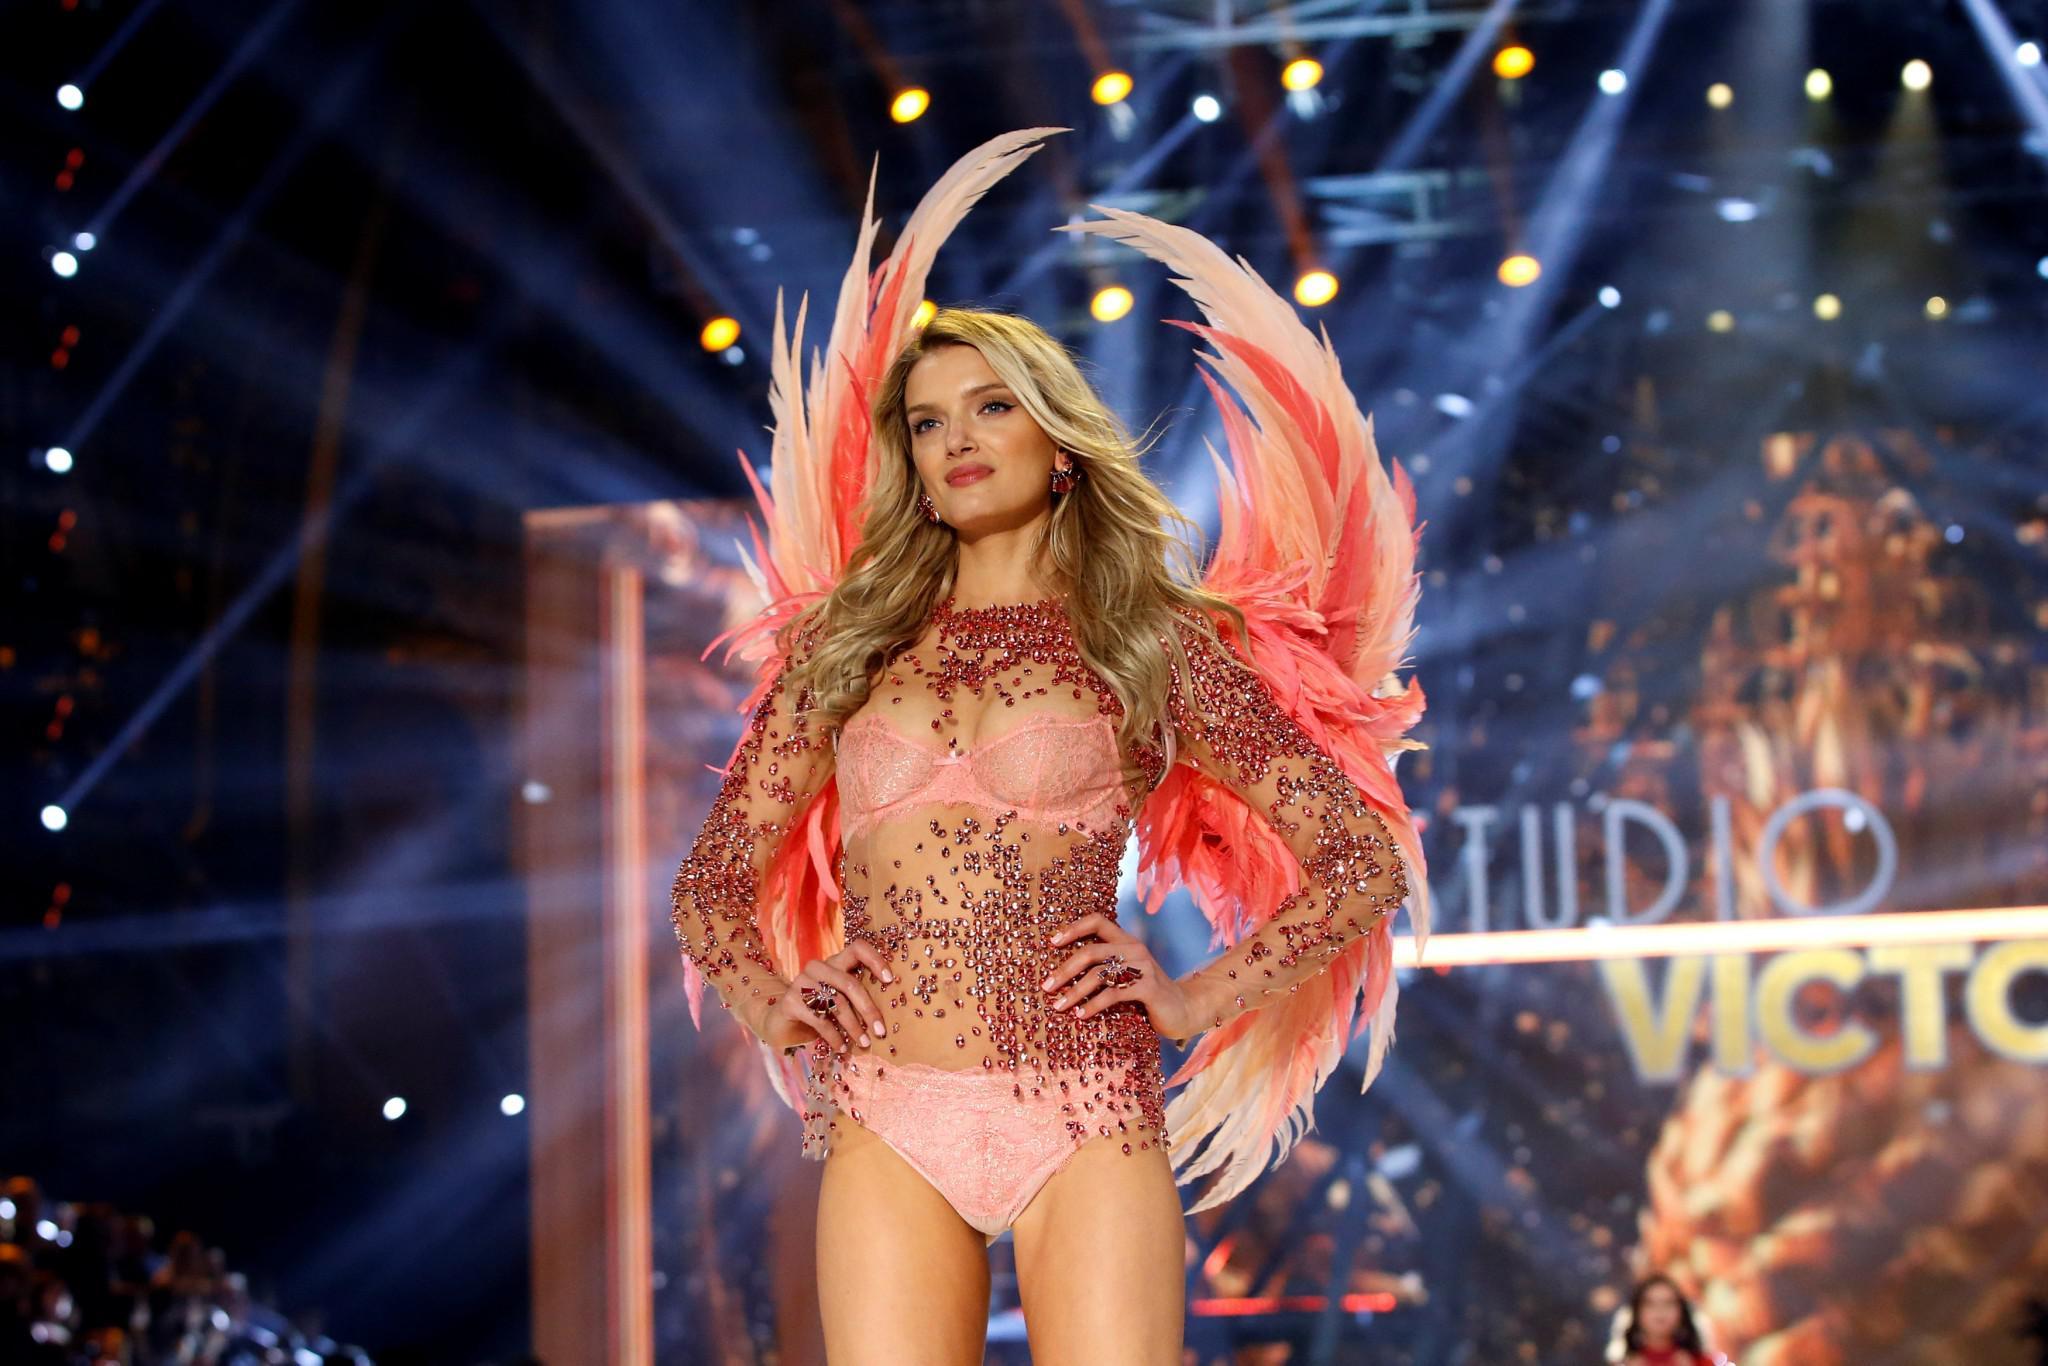 Victoria-Secret-show-esorouxa-modela-1300-8 Το show της Victoria's Secret που «κόλασε» το Παρίσι με τα αγγελάκια της